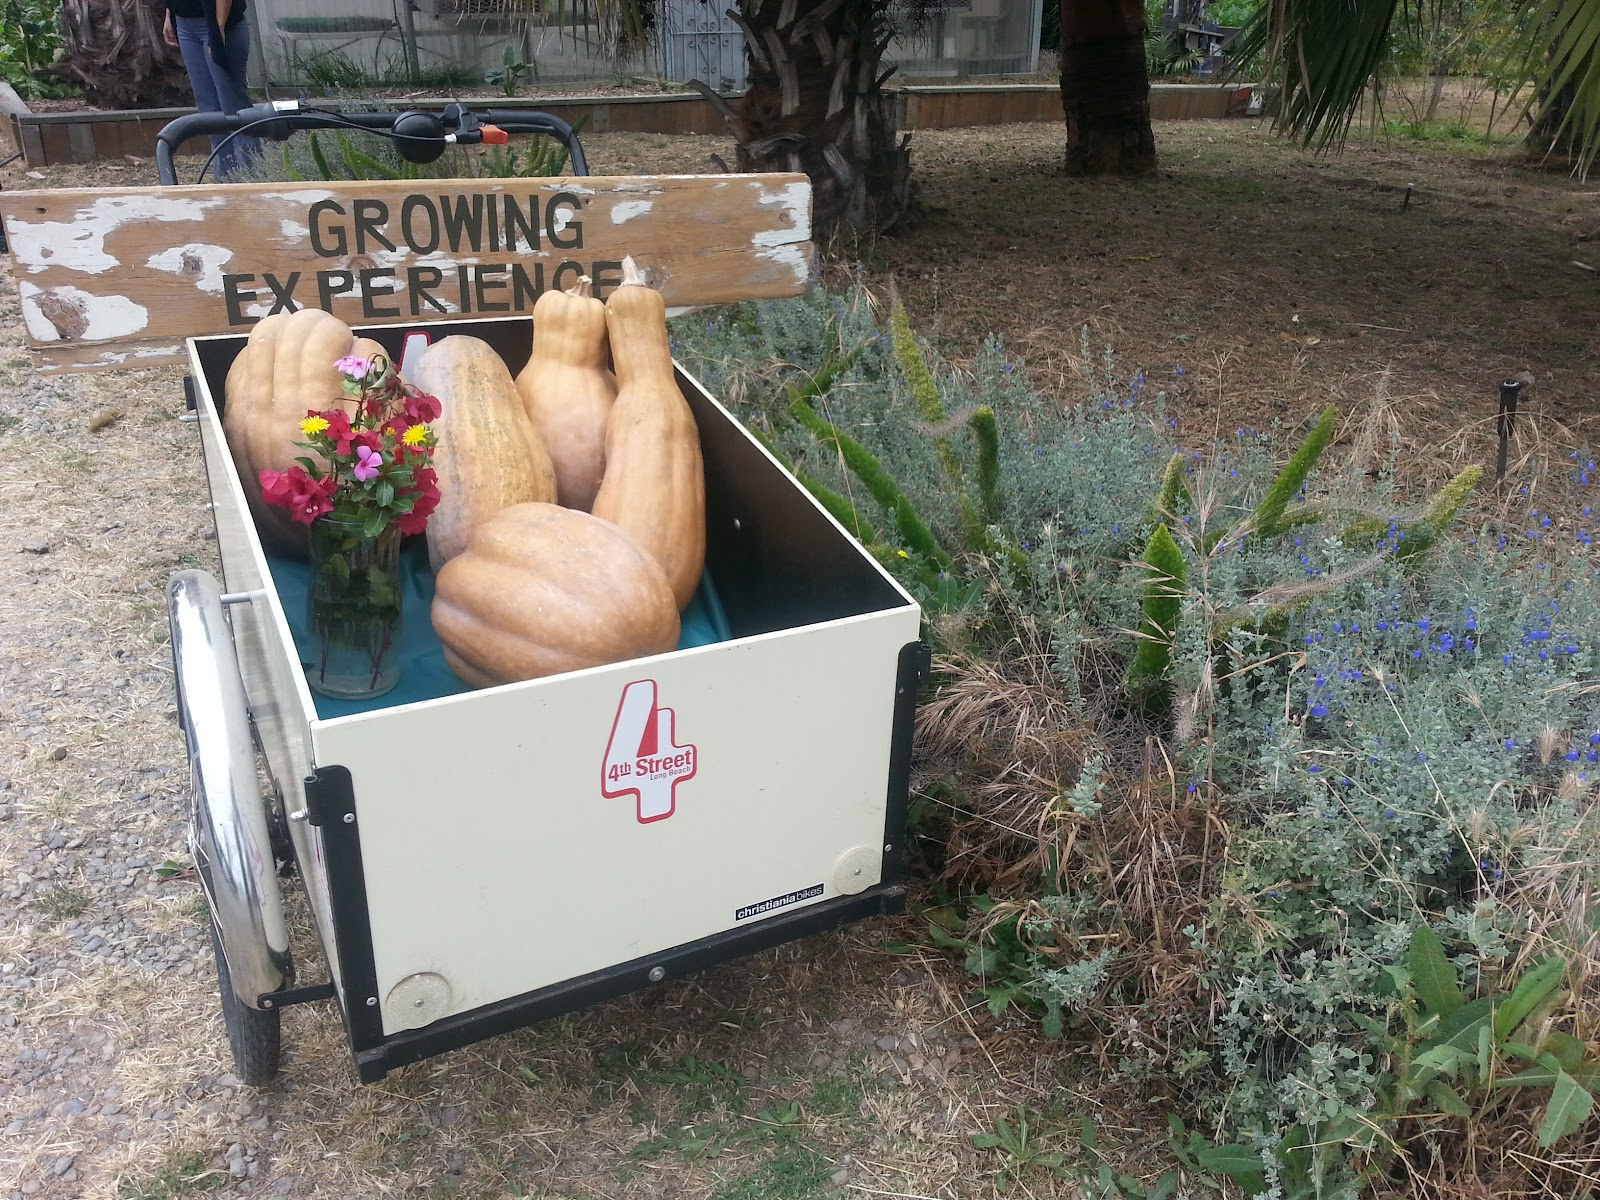 The Growing Experience Urban Farm